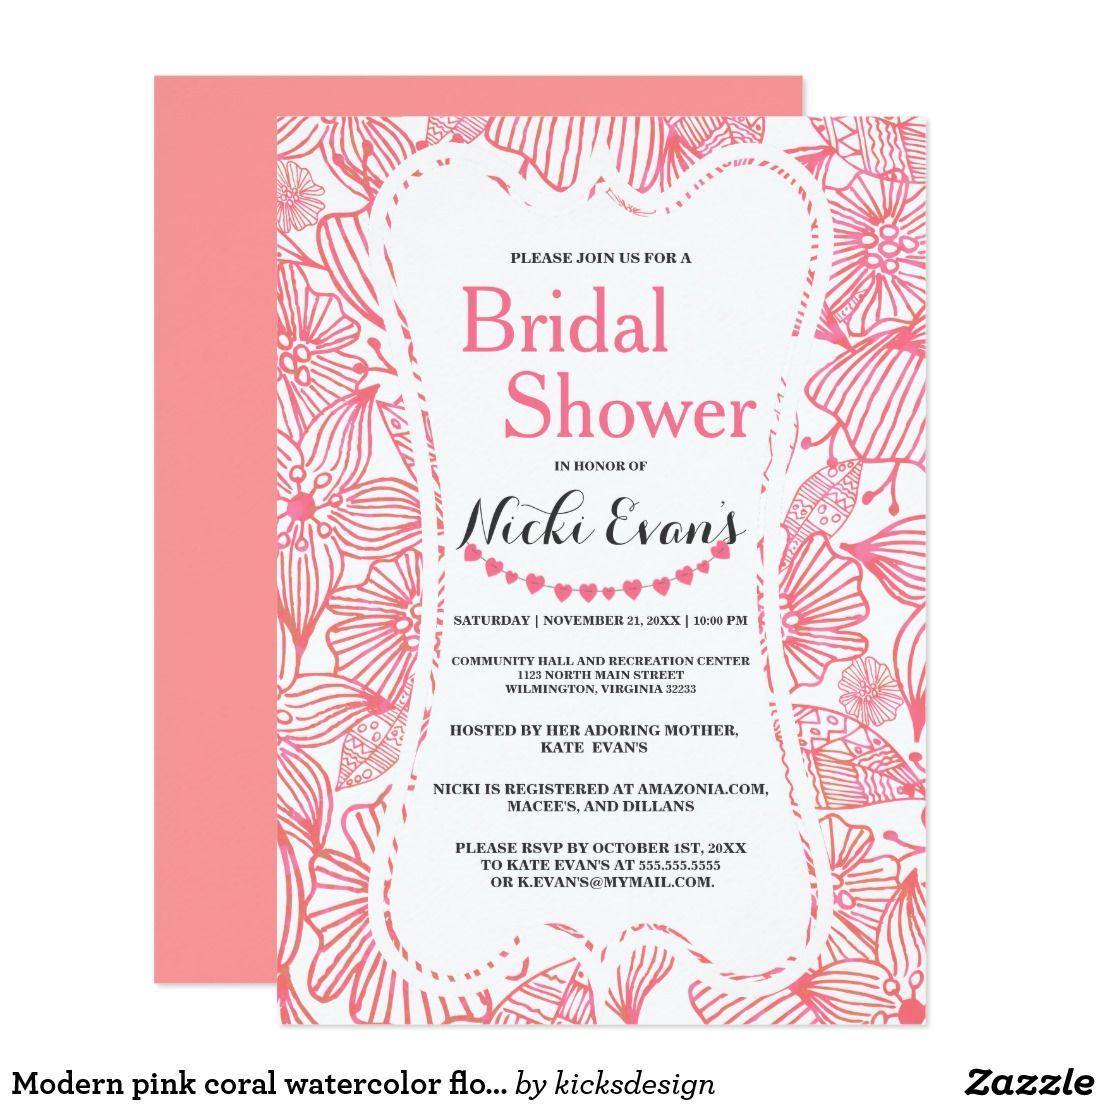 26a6d3376b5e Modern pink coral watercolor floral Bridal Shower Invitation ...